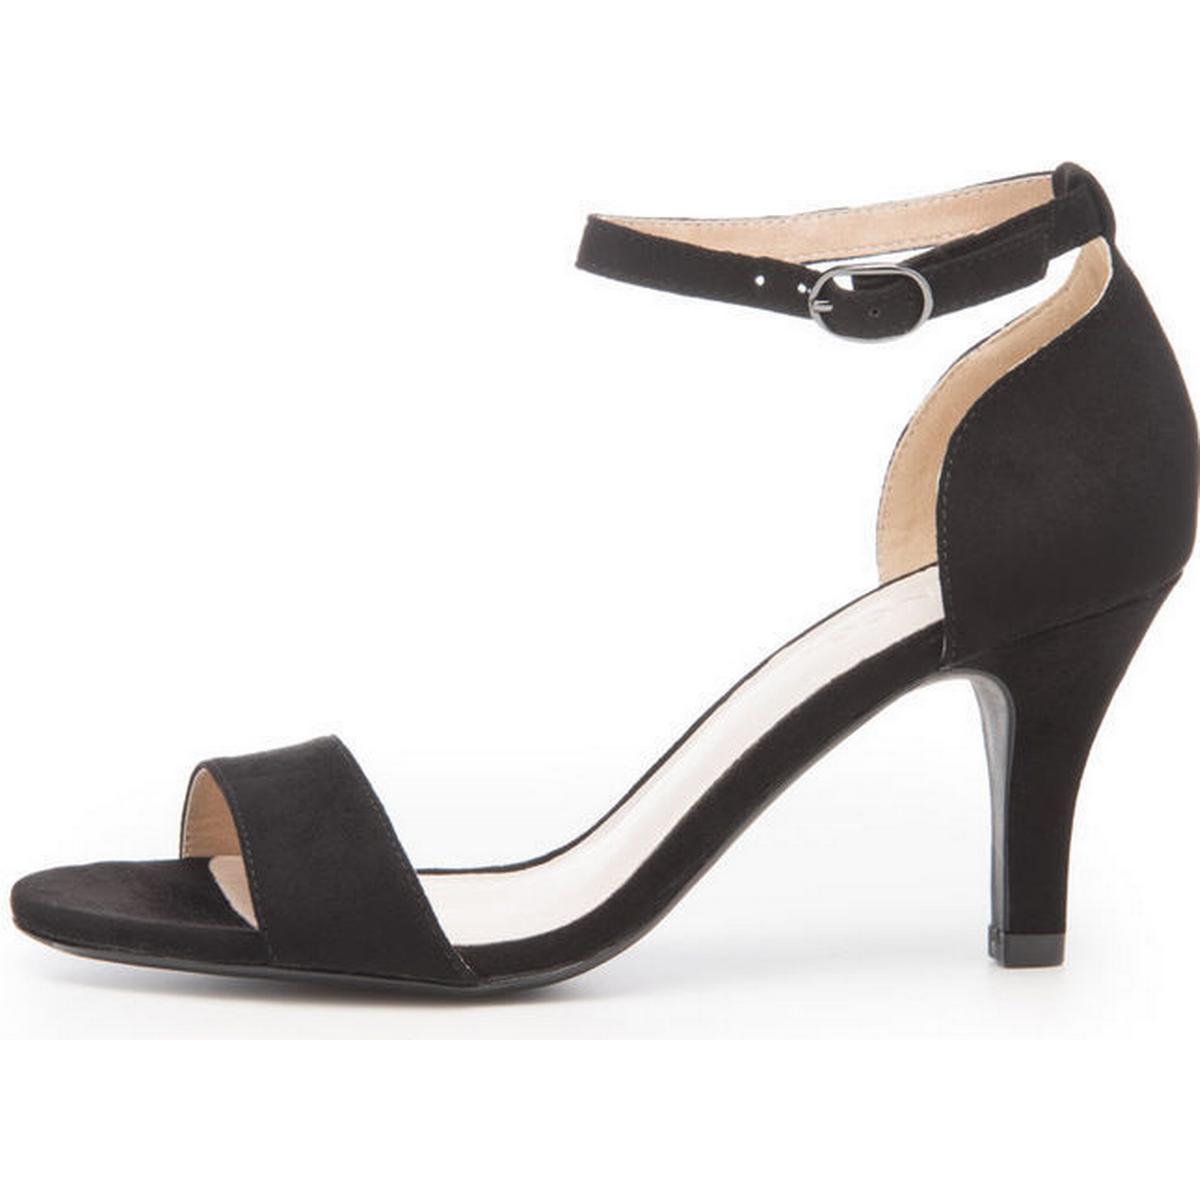 809648ac323 Bianco Sandaler och Sandaletter - Jämför priser på Sandal och Sandalett  PriceRunner